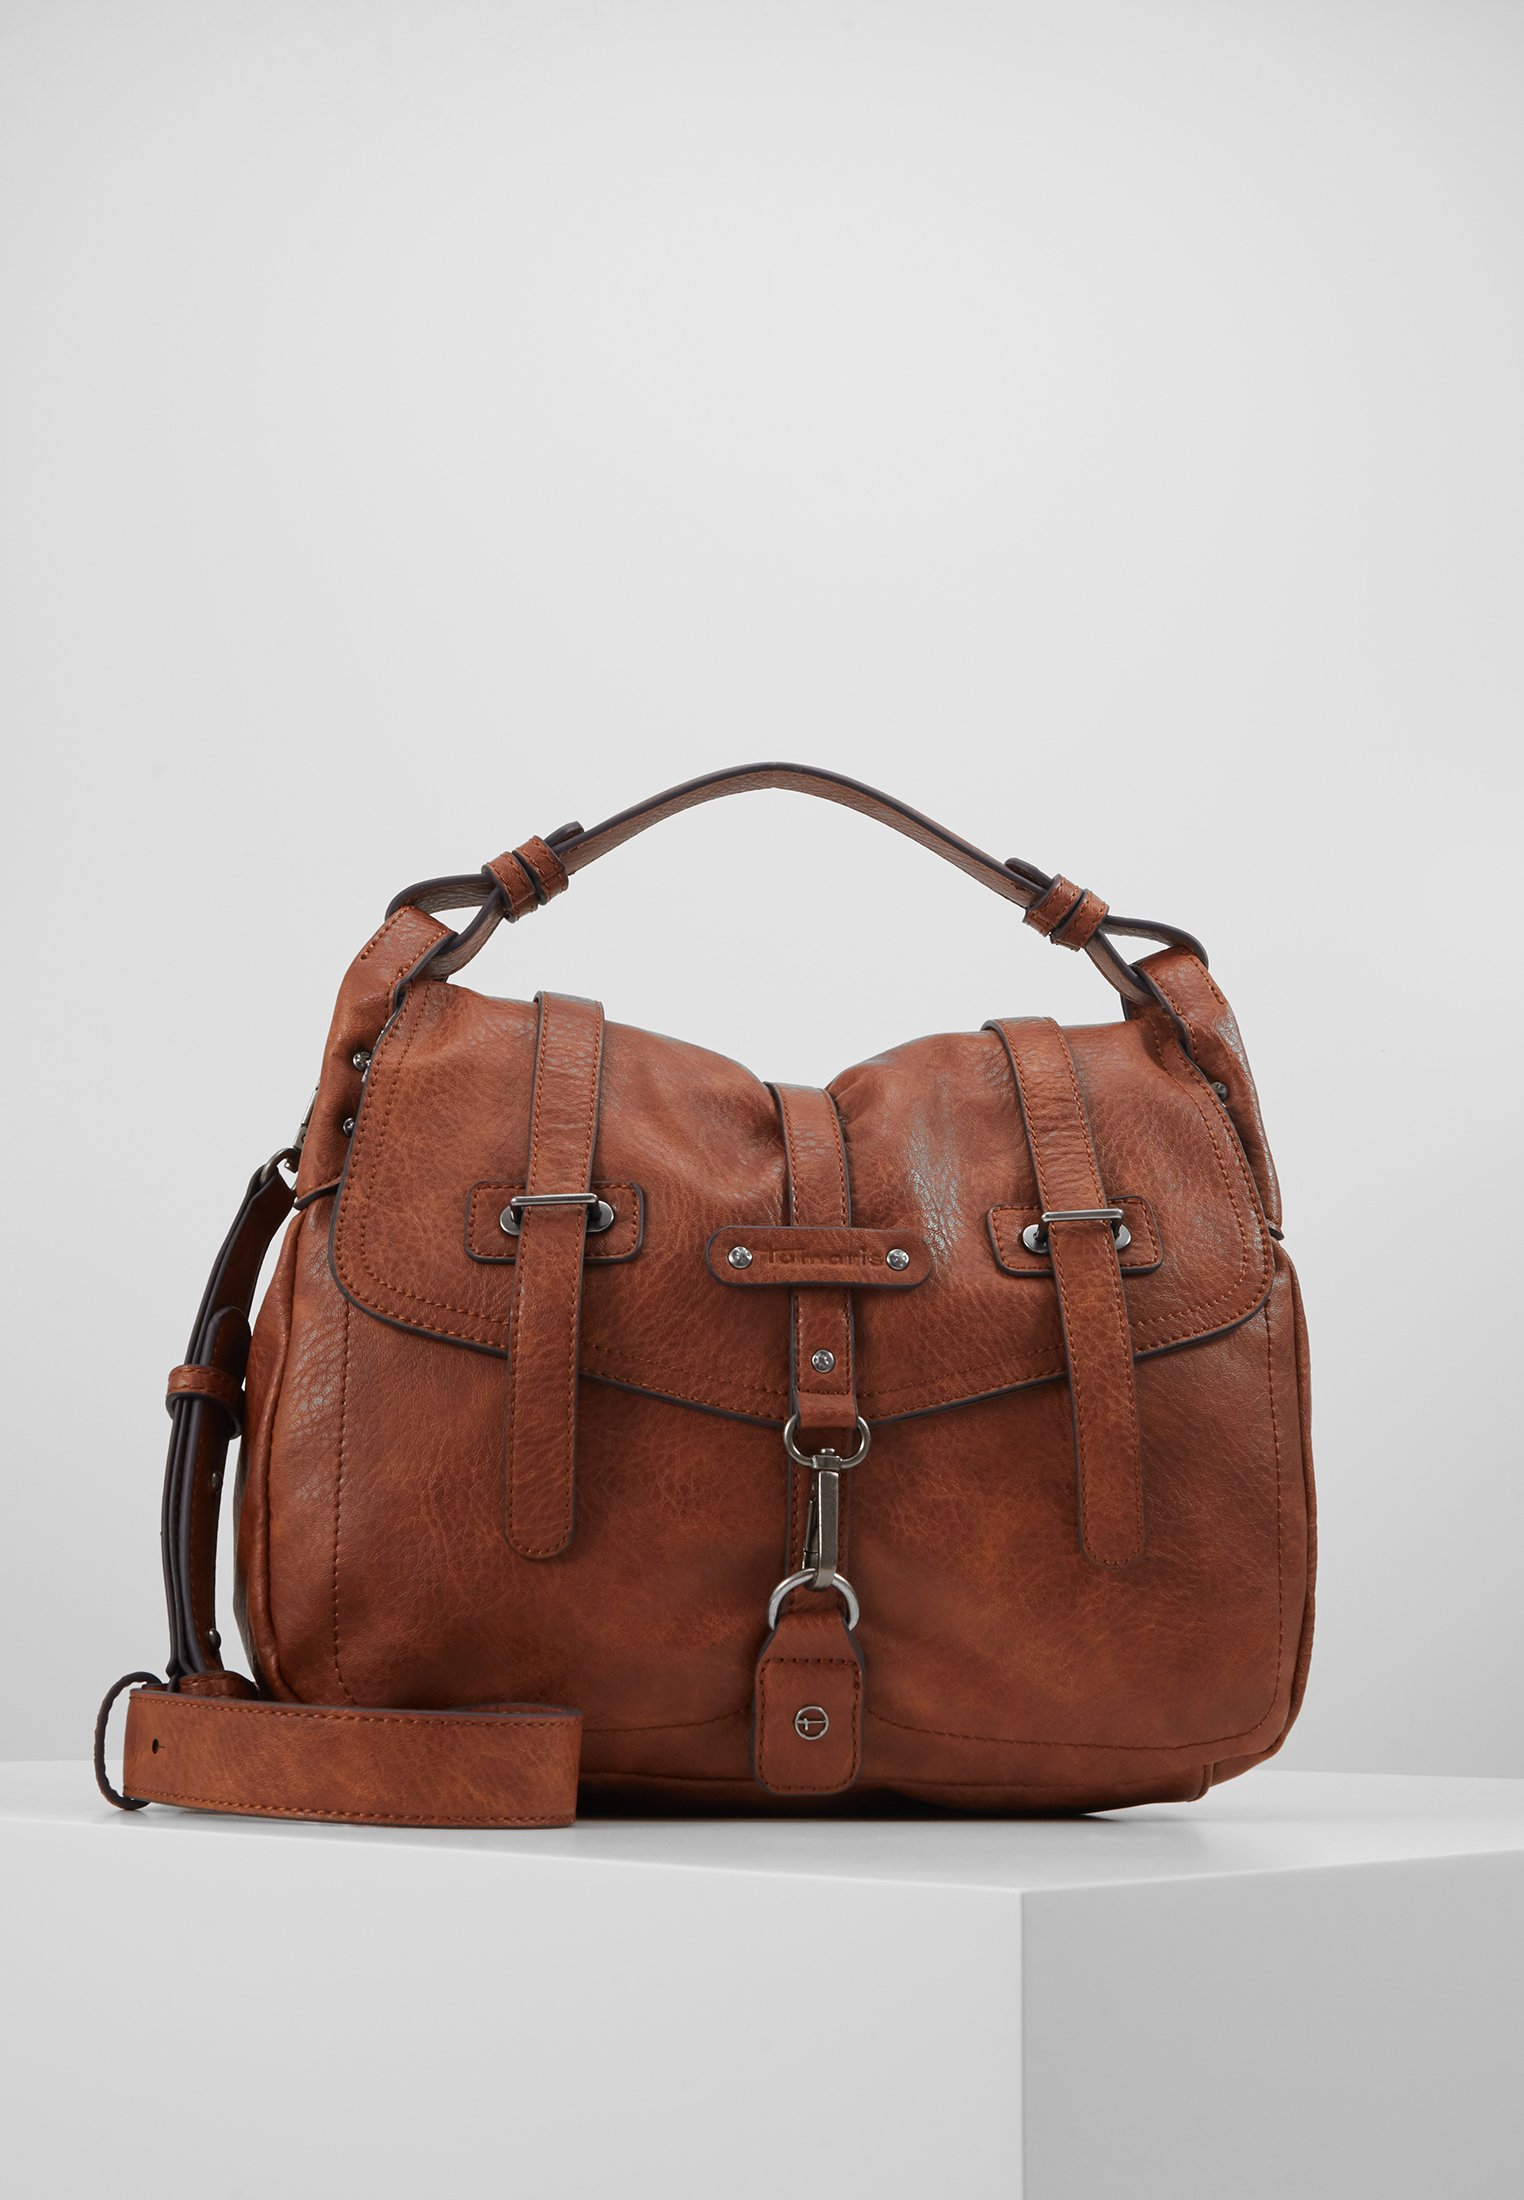 New Styles New Lower Prices Accessories Tamaris BERNADETTE Handbag cognac i1KJ0HuGE jMuptTqxr